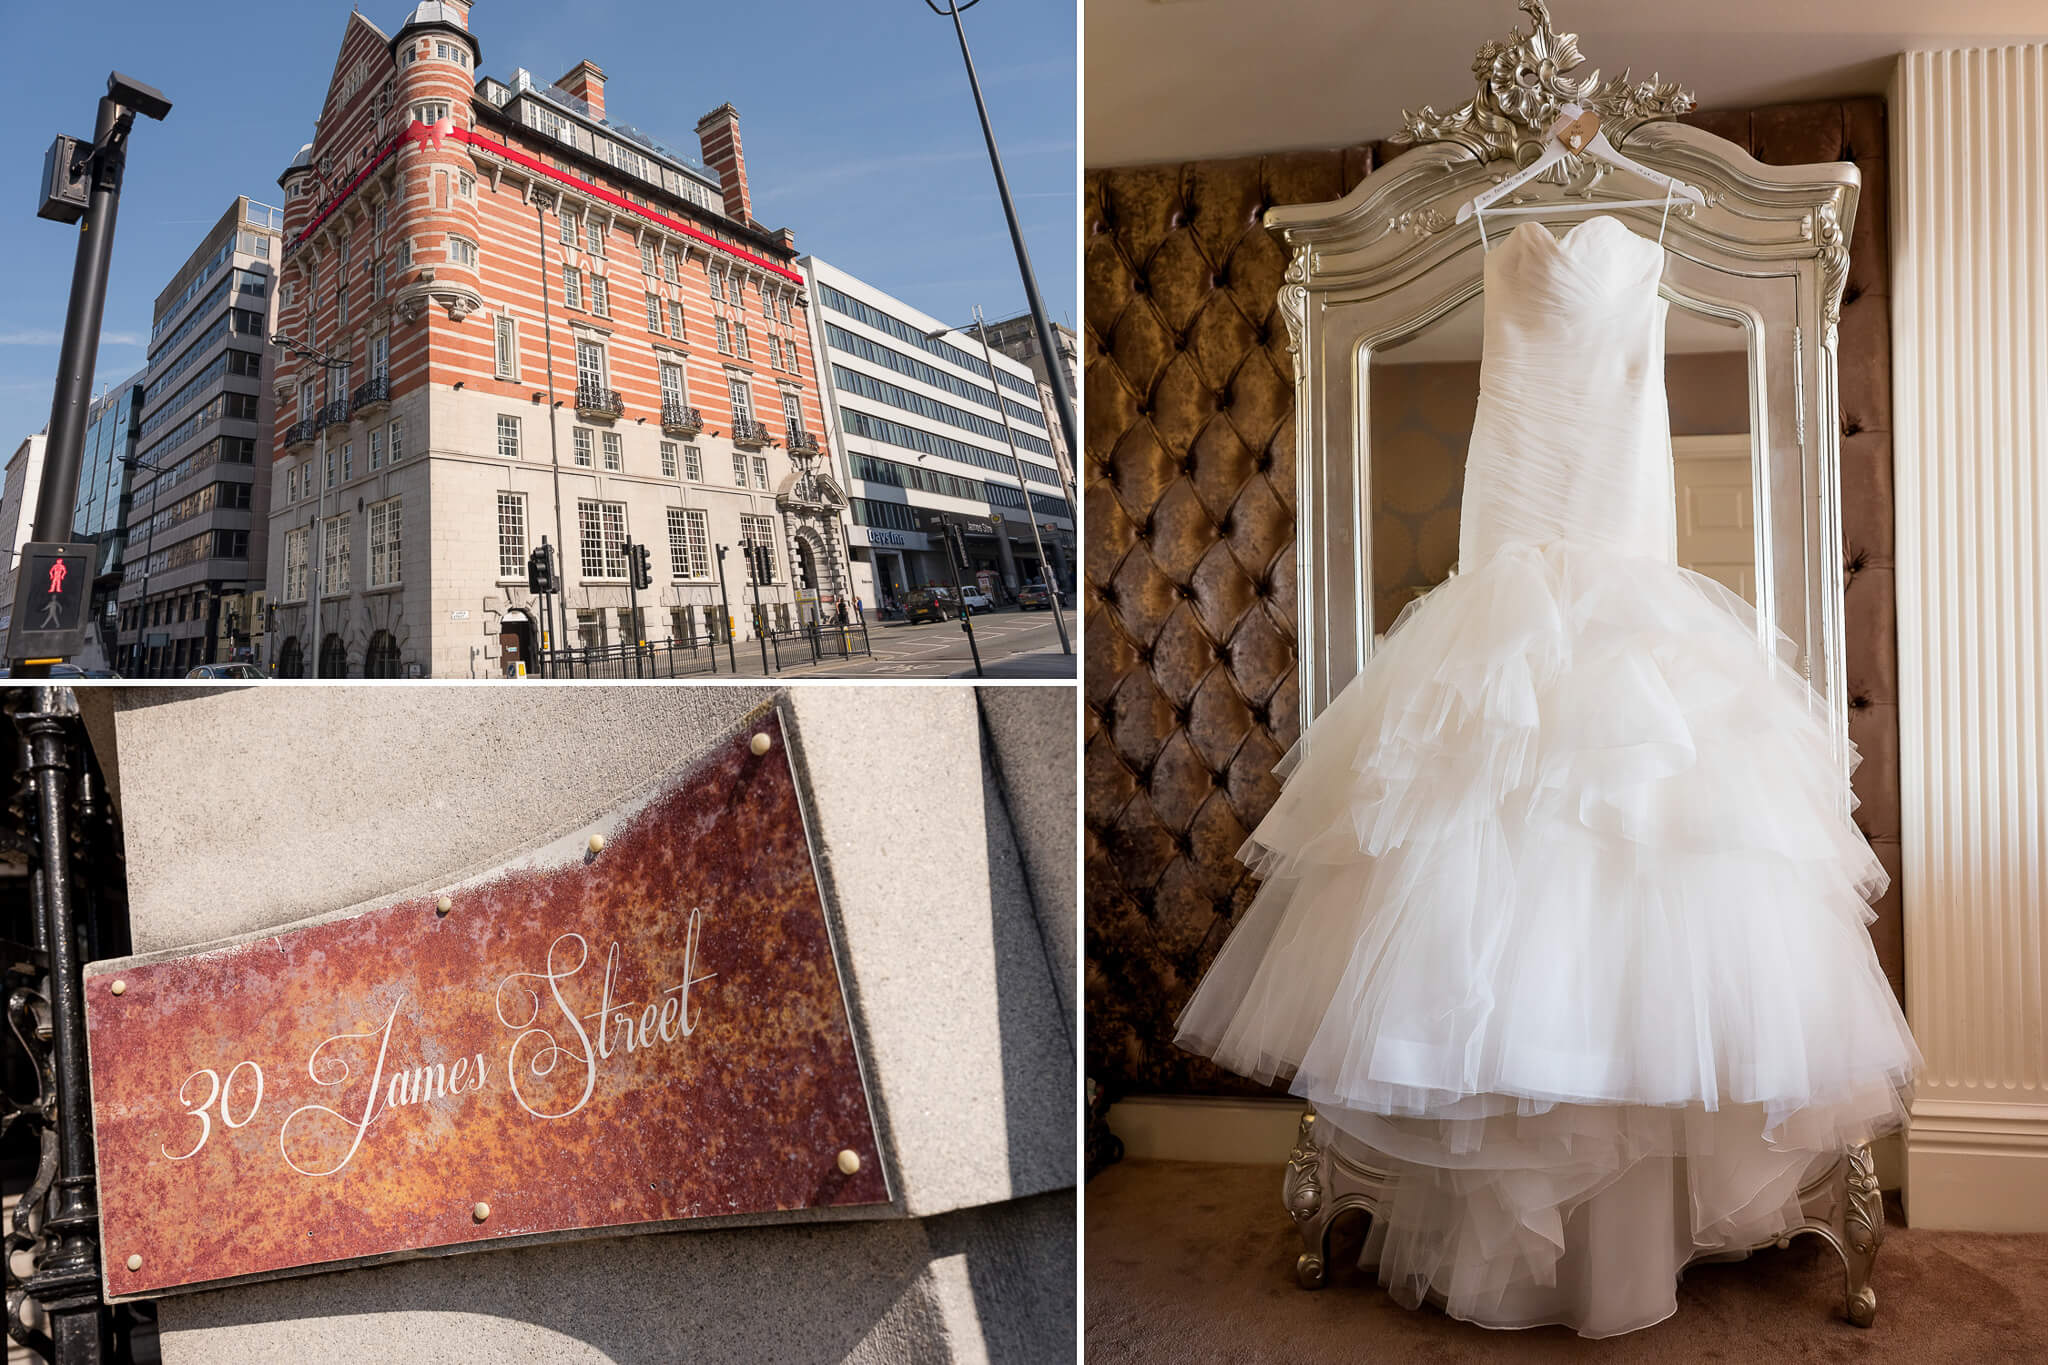 liverpool-titanic-hotel-wedding-dress-30-james-street